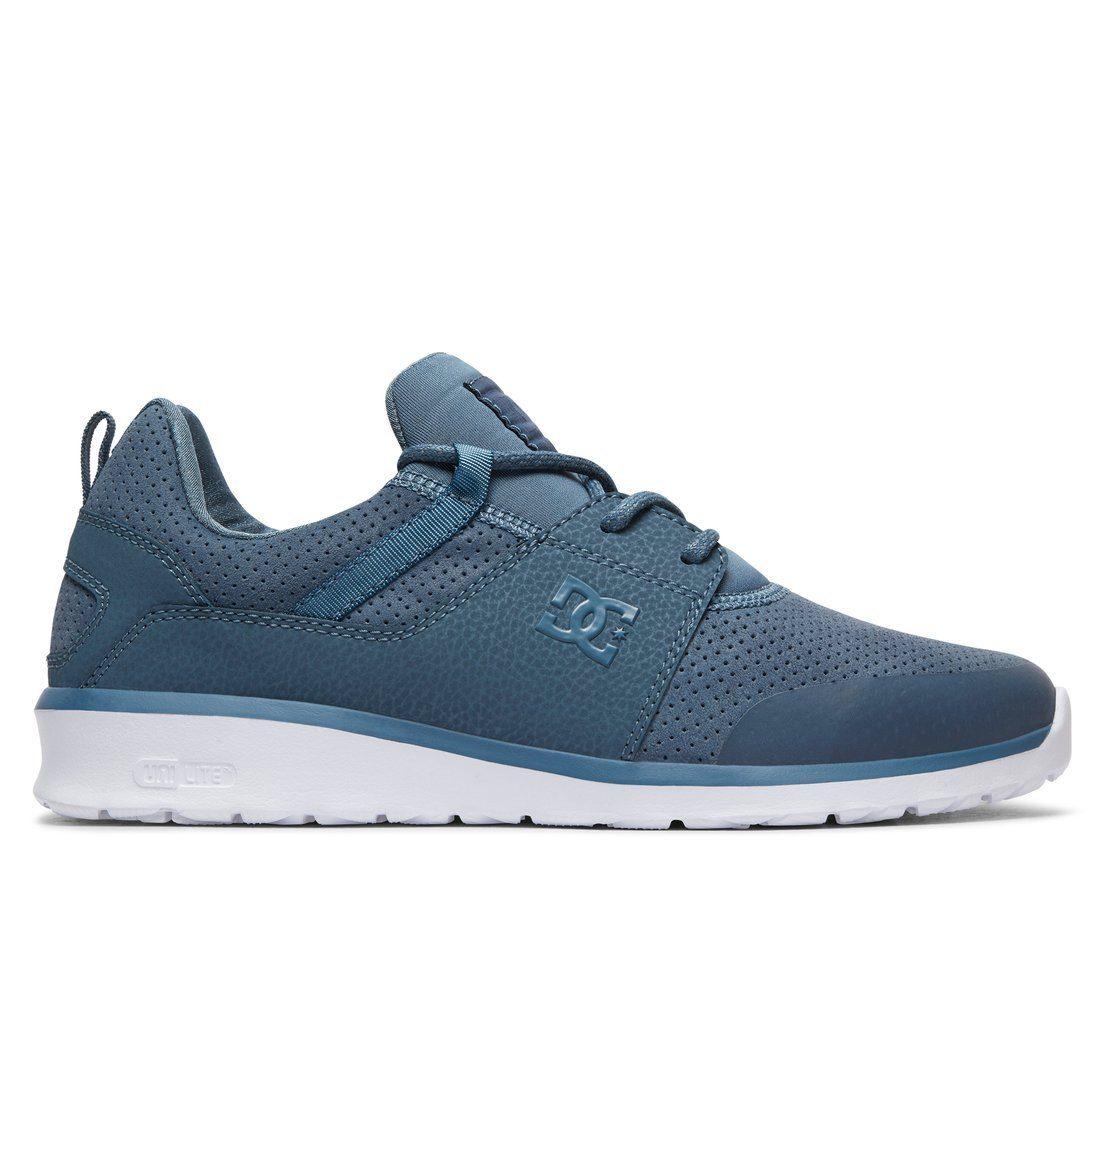 DC Shoes Schuhe Heathrow Prestige online kaufen  Blue ashes#ft5_slash#white